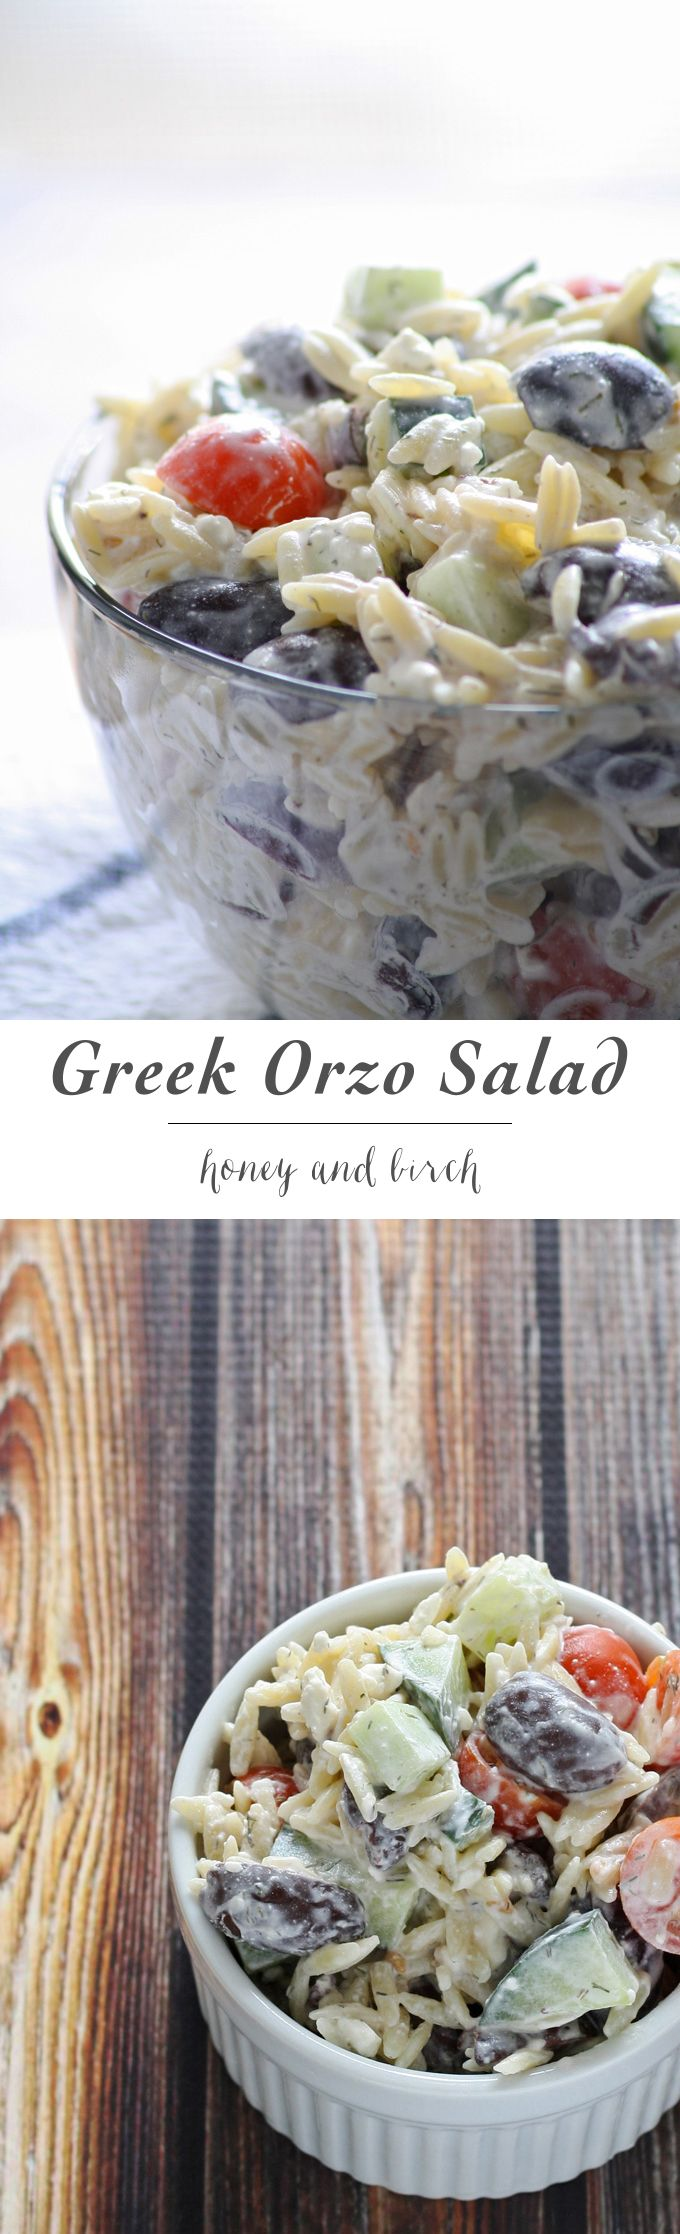 An easy and refreshing Greek orzo salad. Perfect for Kalamata olive lovers!   www.honeyandbirch.com